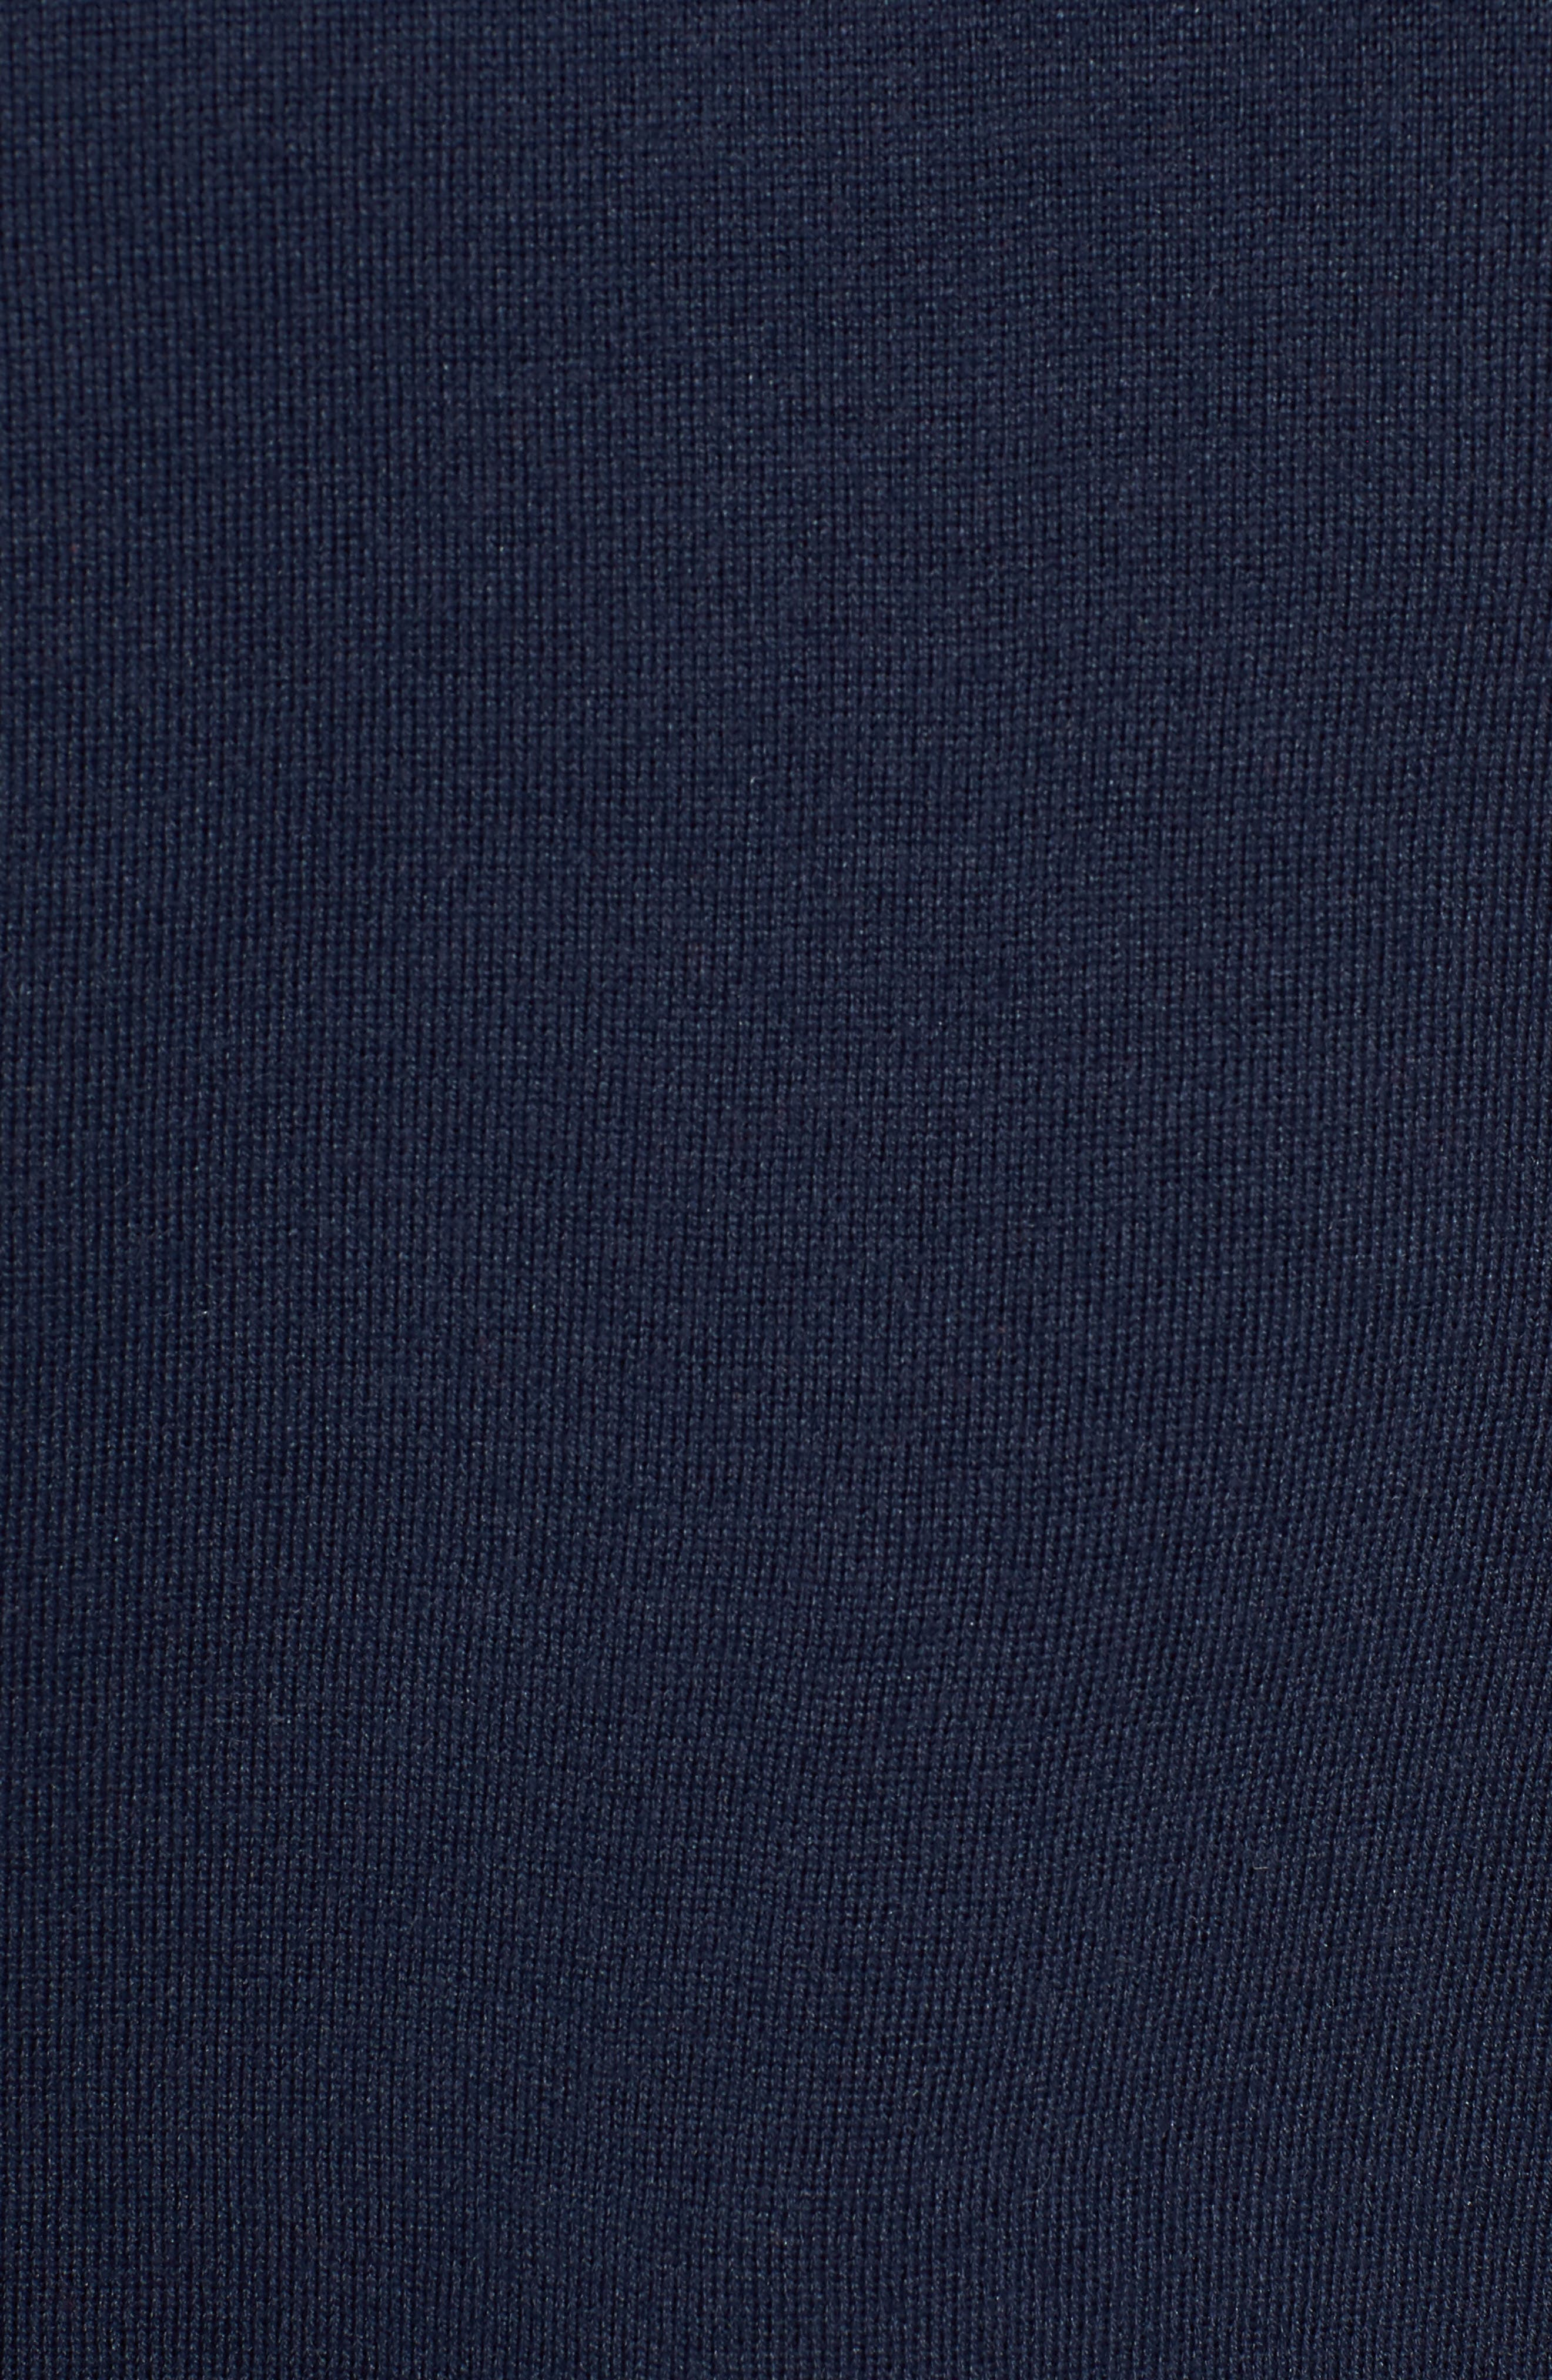 TJW Colorblock Sweater,                             Alternate thumbnail 5, color,                             BLUE